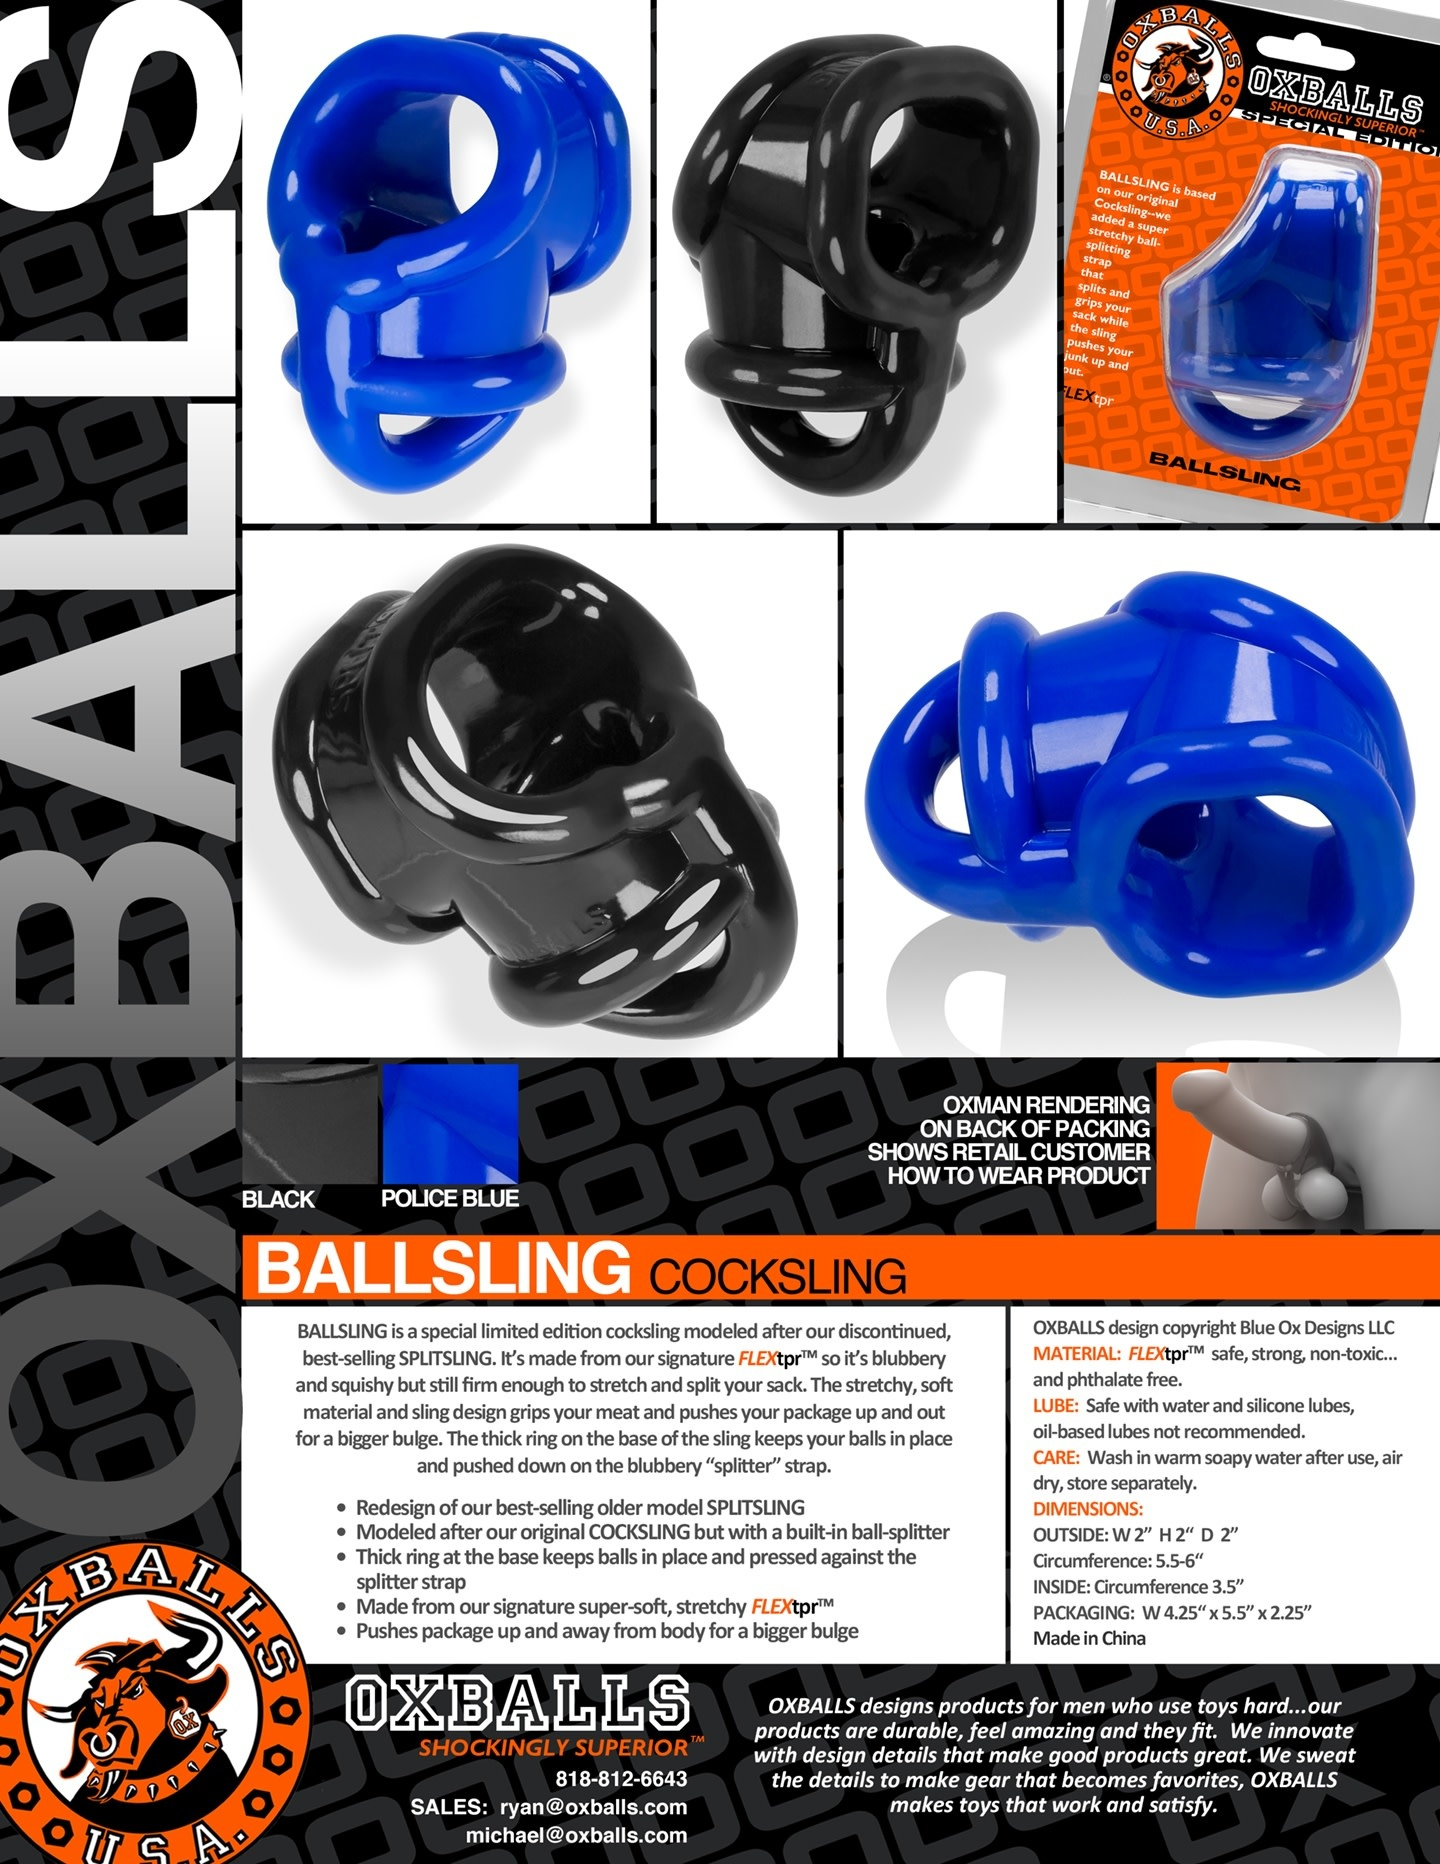 BALLSLING